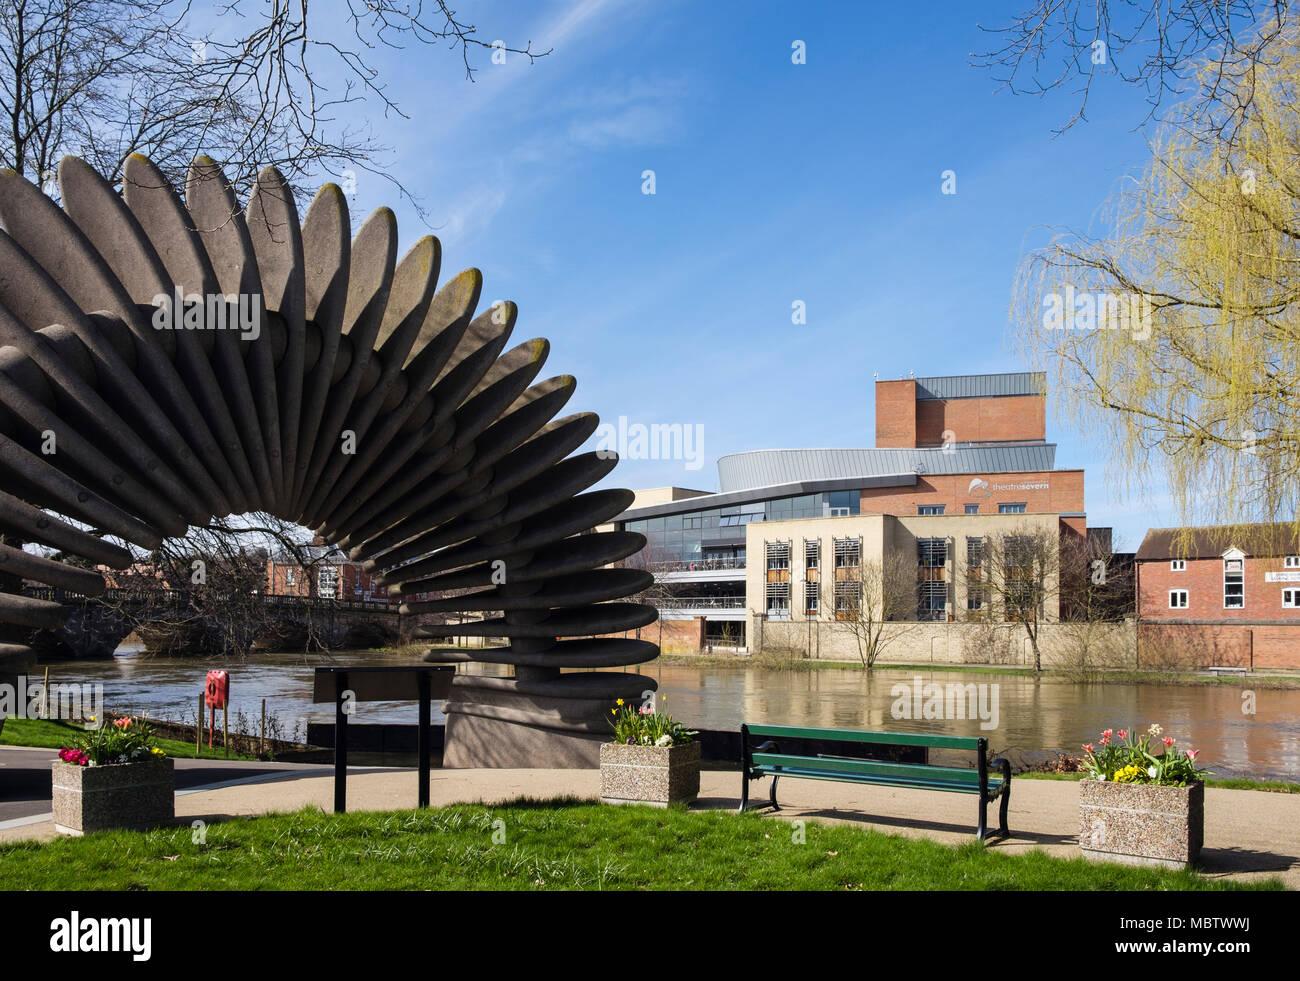 Quantum Leap sculpture in gardens by River Severn opposite TheatreSevern. Mardol Quay, Shrewsbury, Shropshire, West Midlands, England, UK, Britain - Stock Image